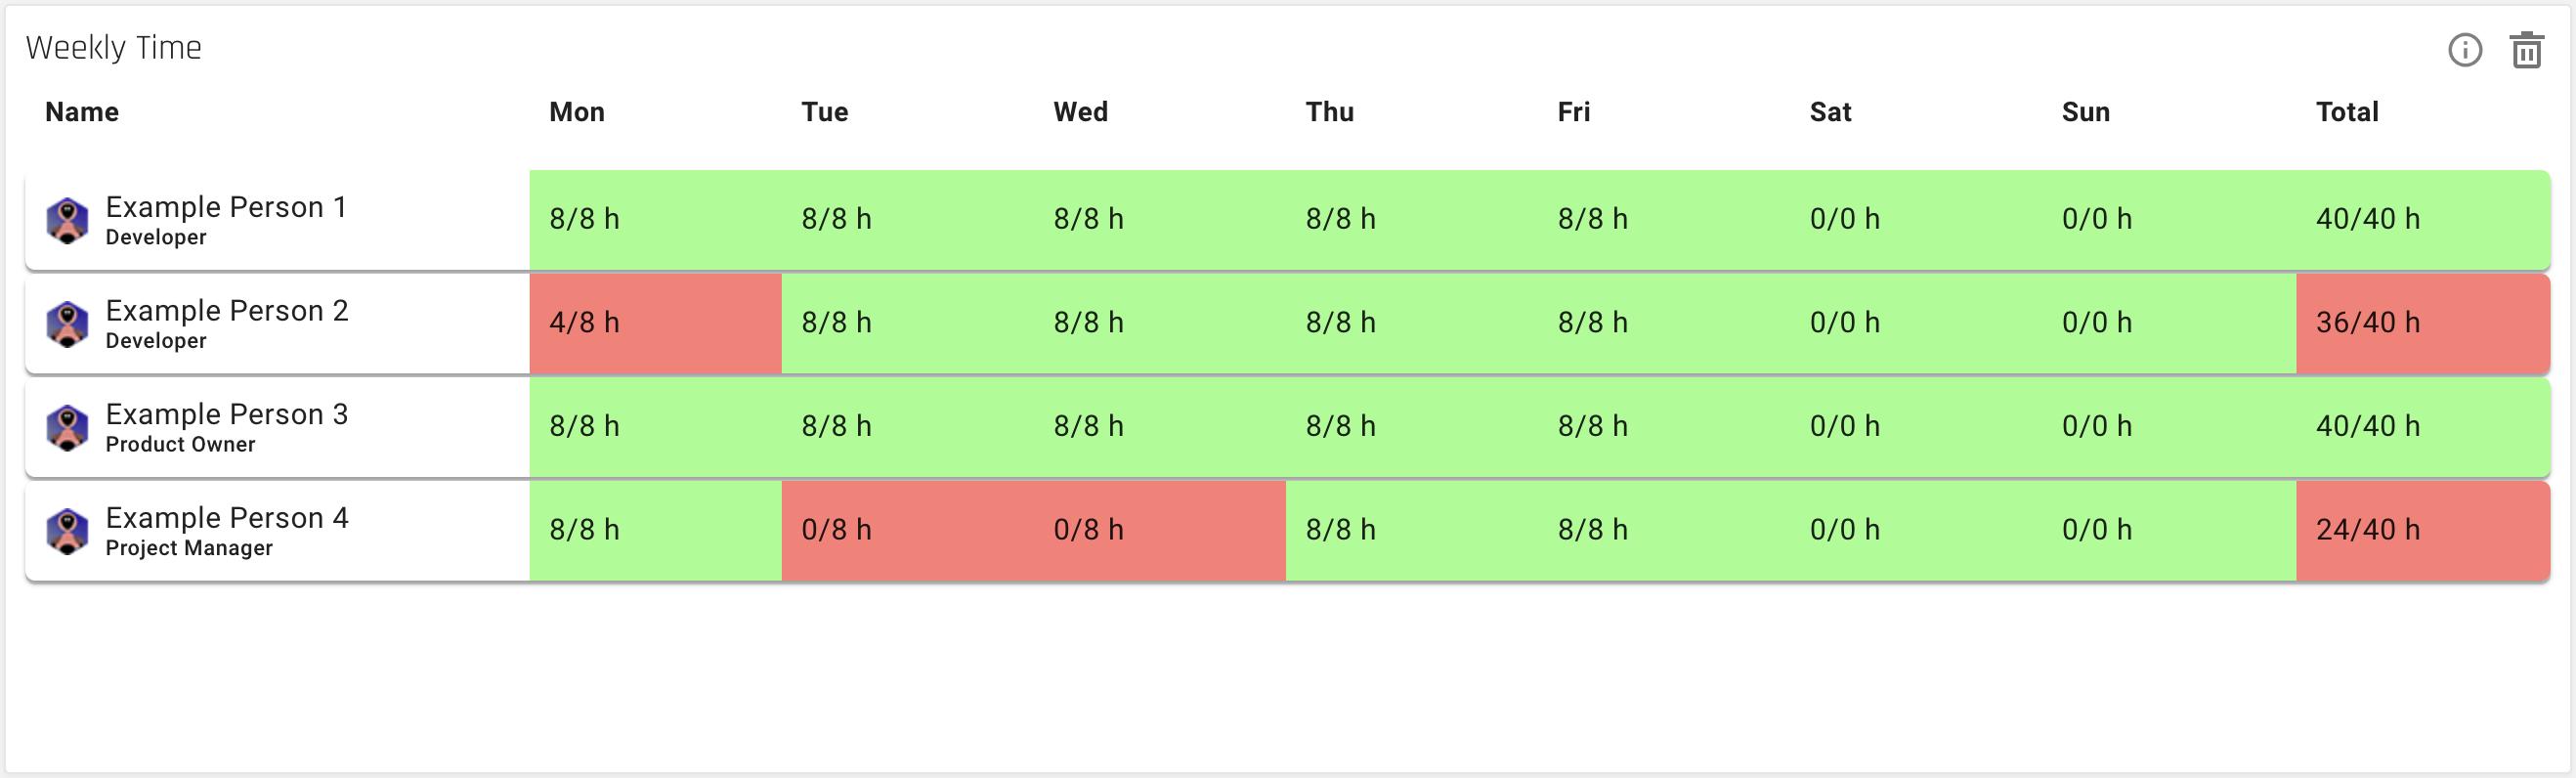 forecast_insights-weeklytime